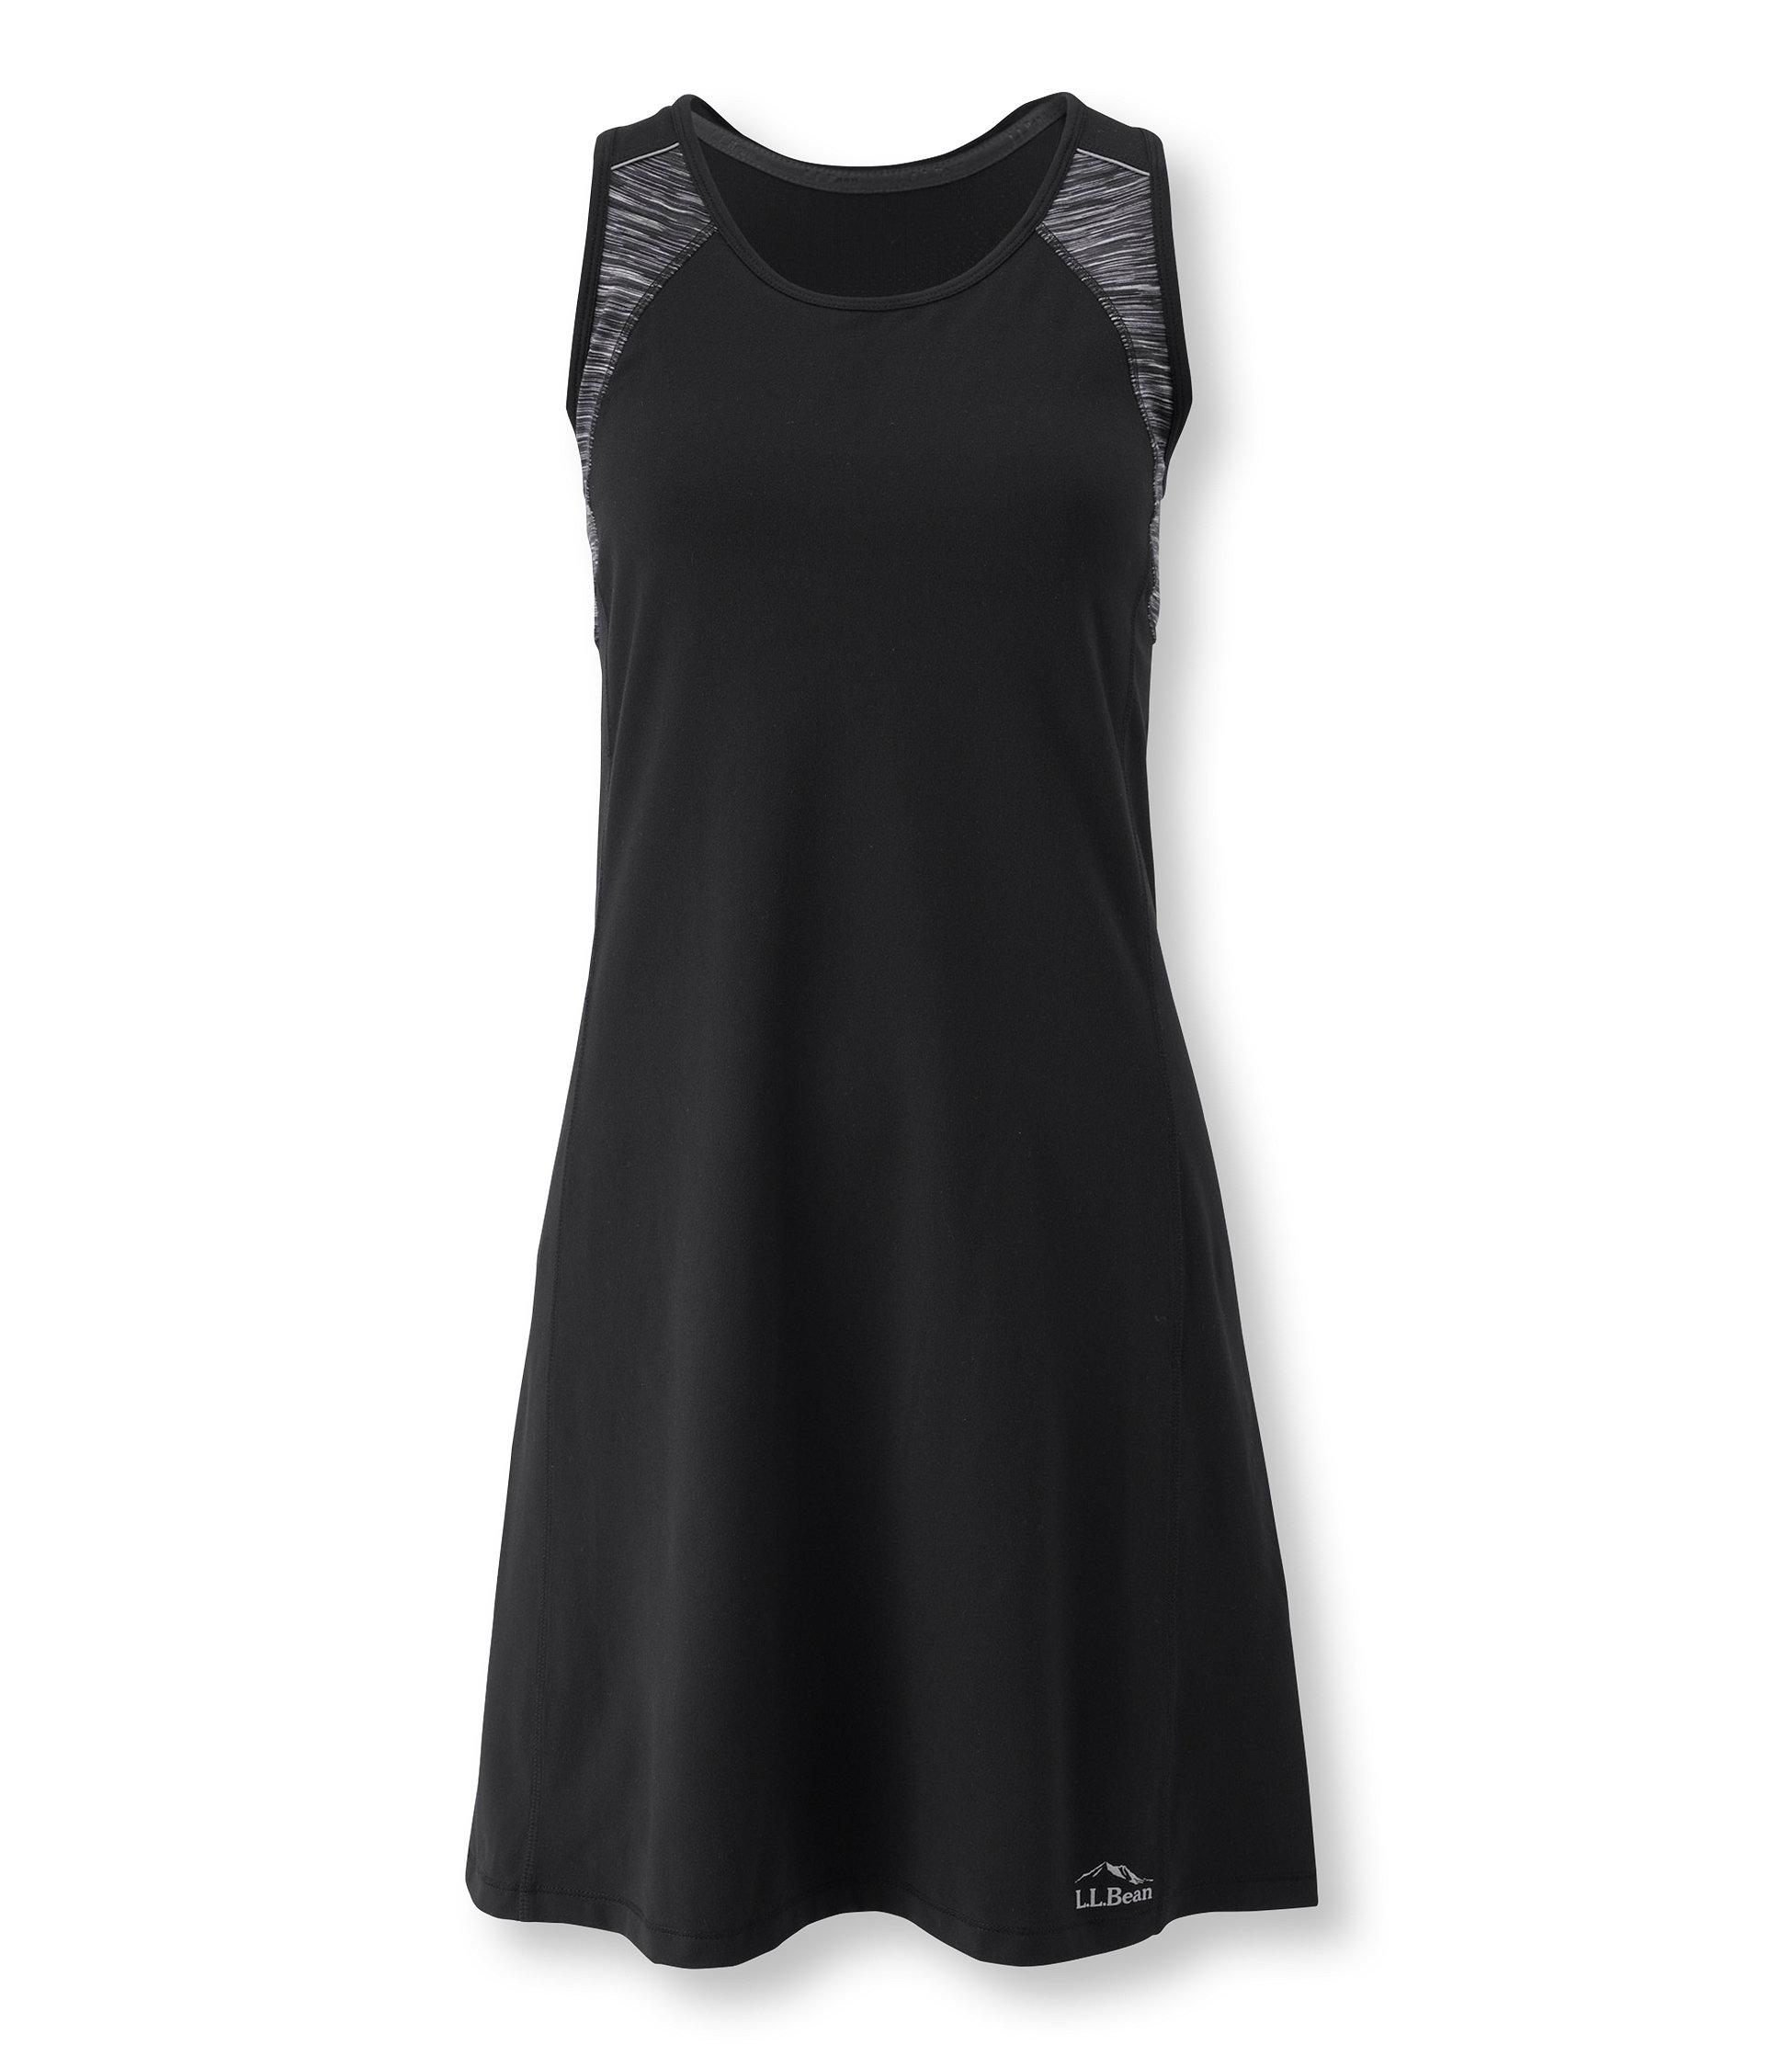 L.L.Bean Powerflow Dress